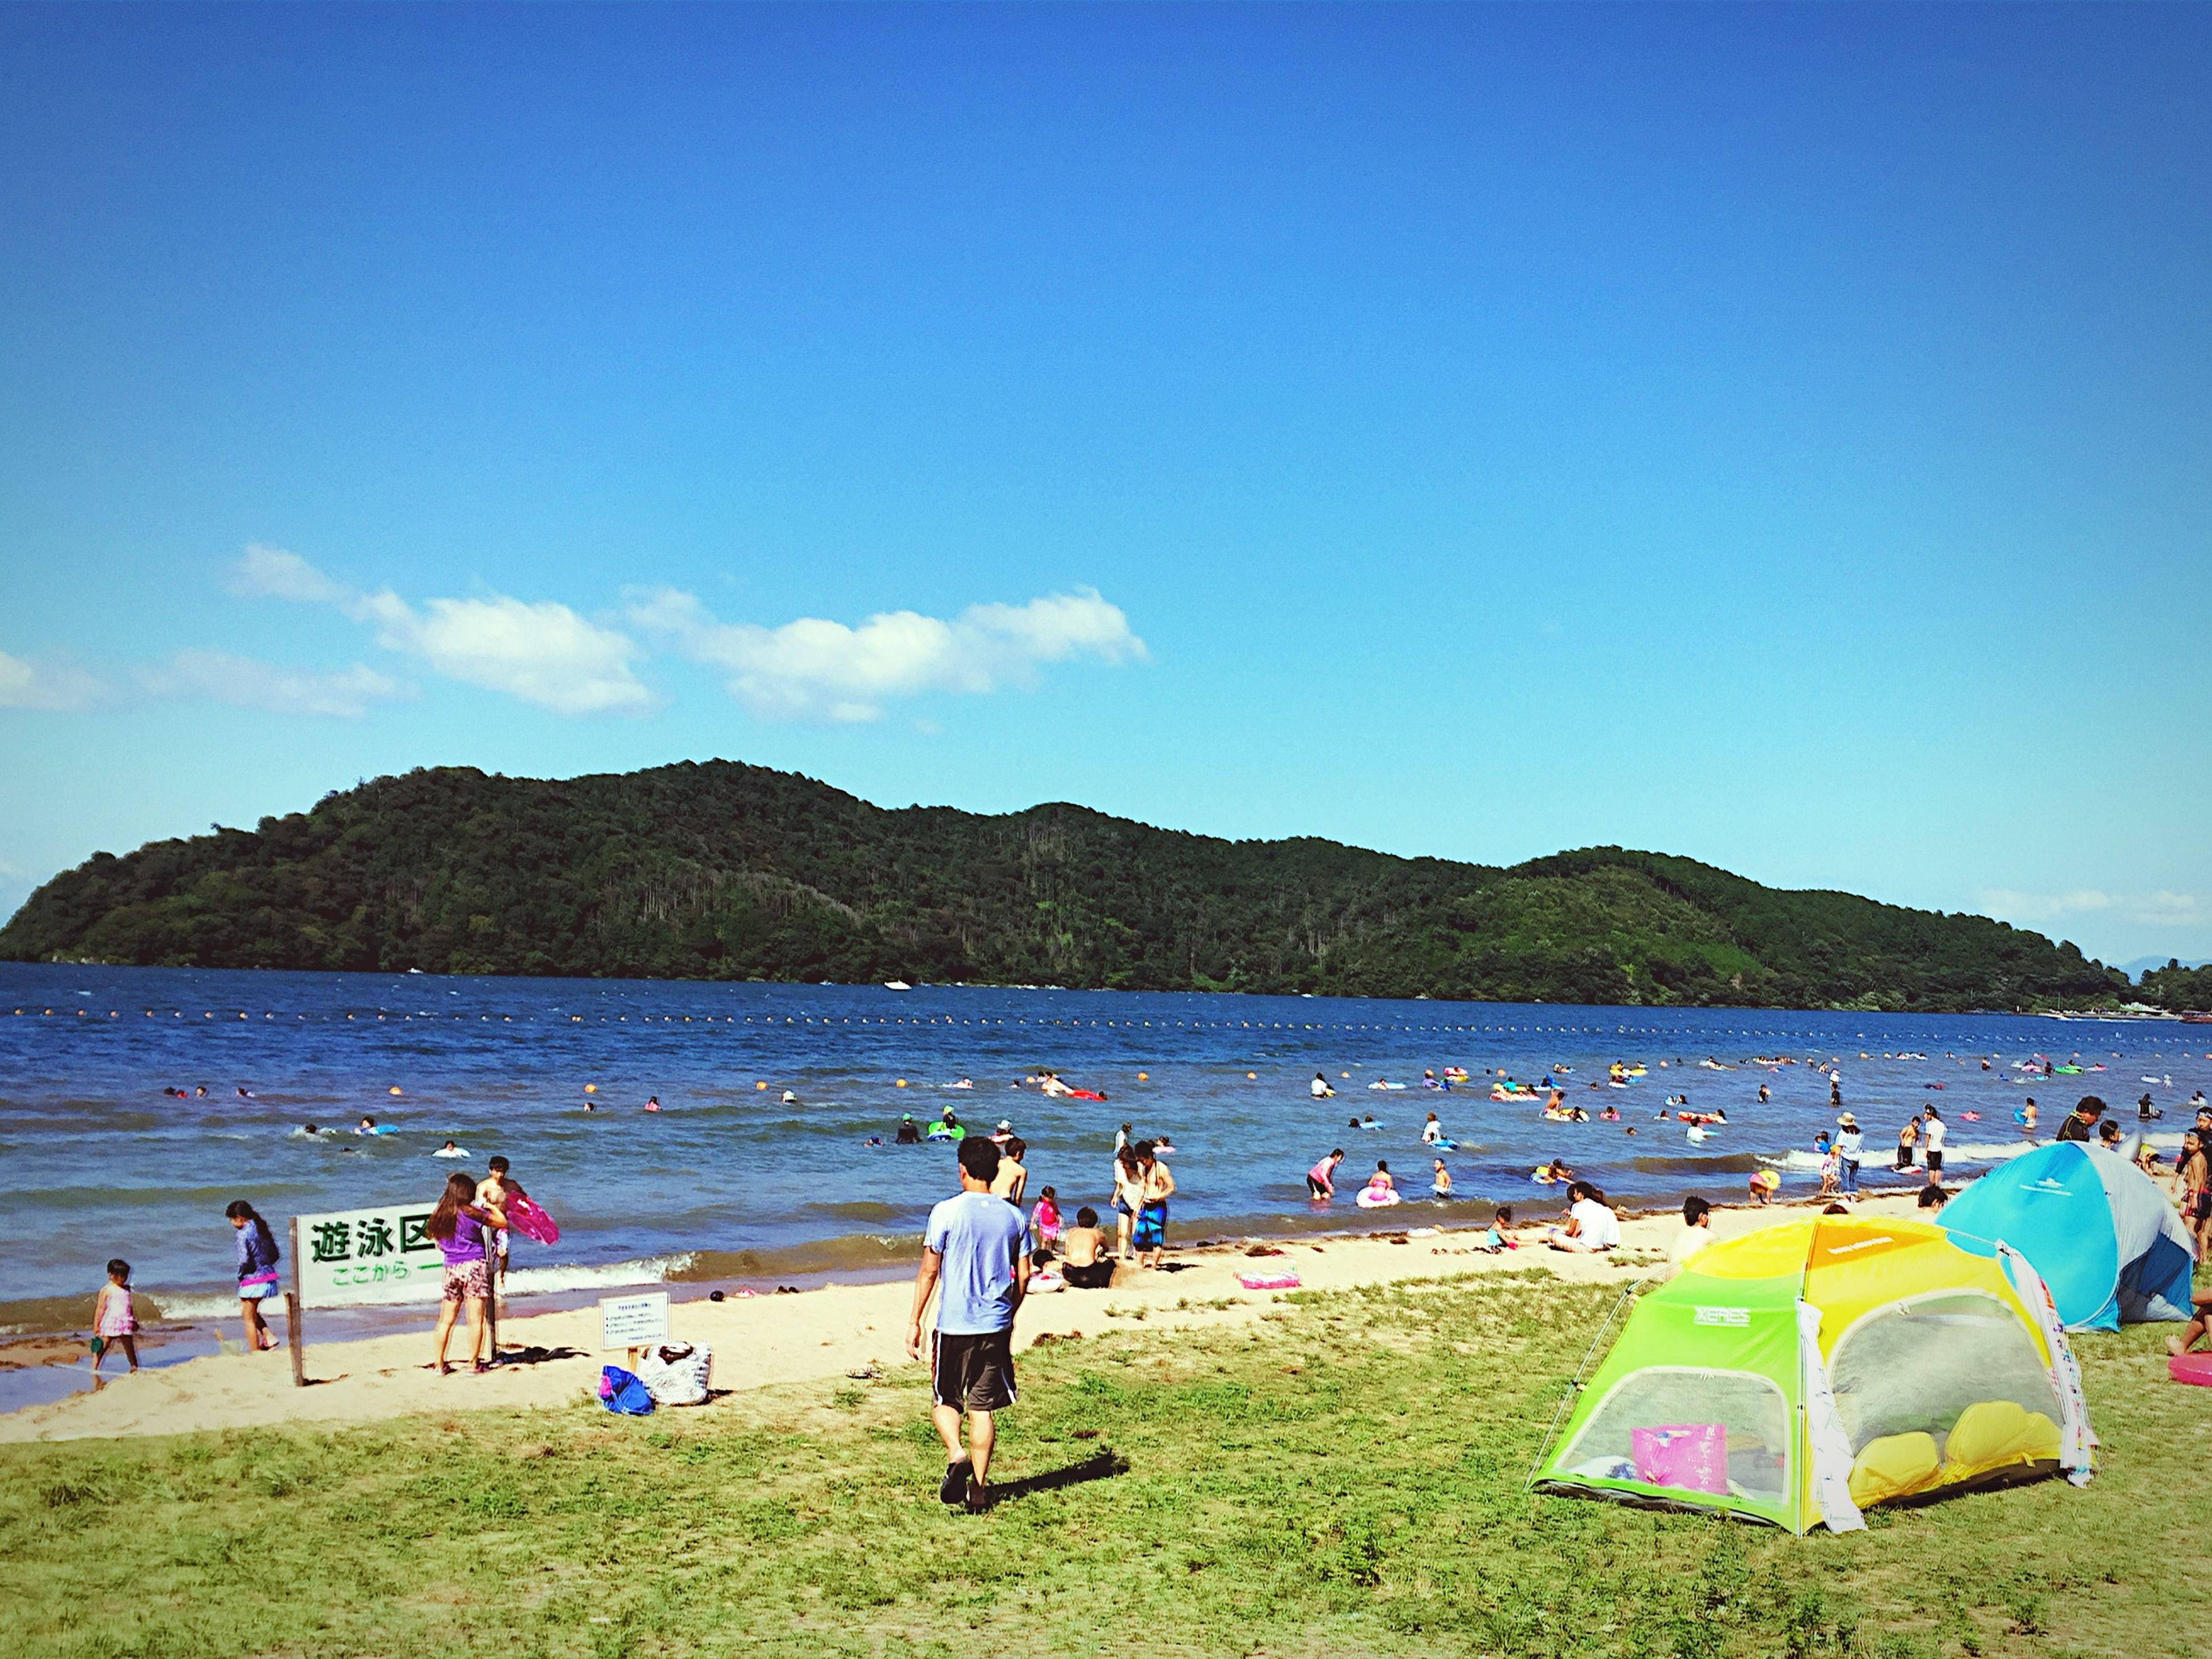 Beach Lakeside Bathing 琵琶湖 Lake Biwa